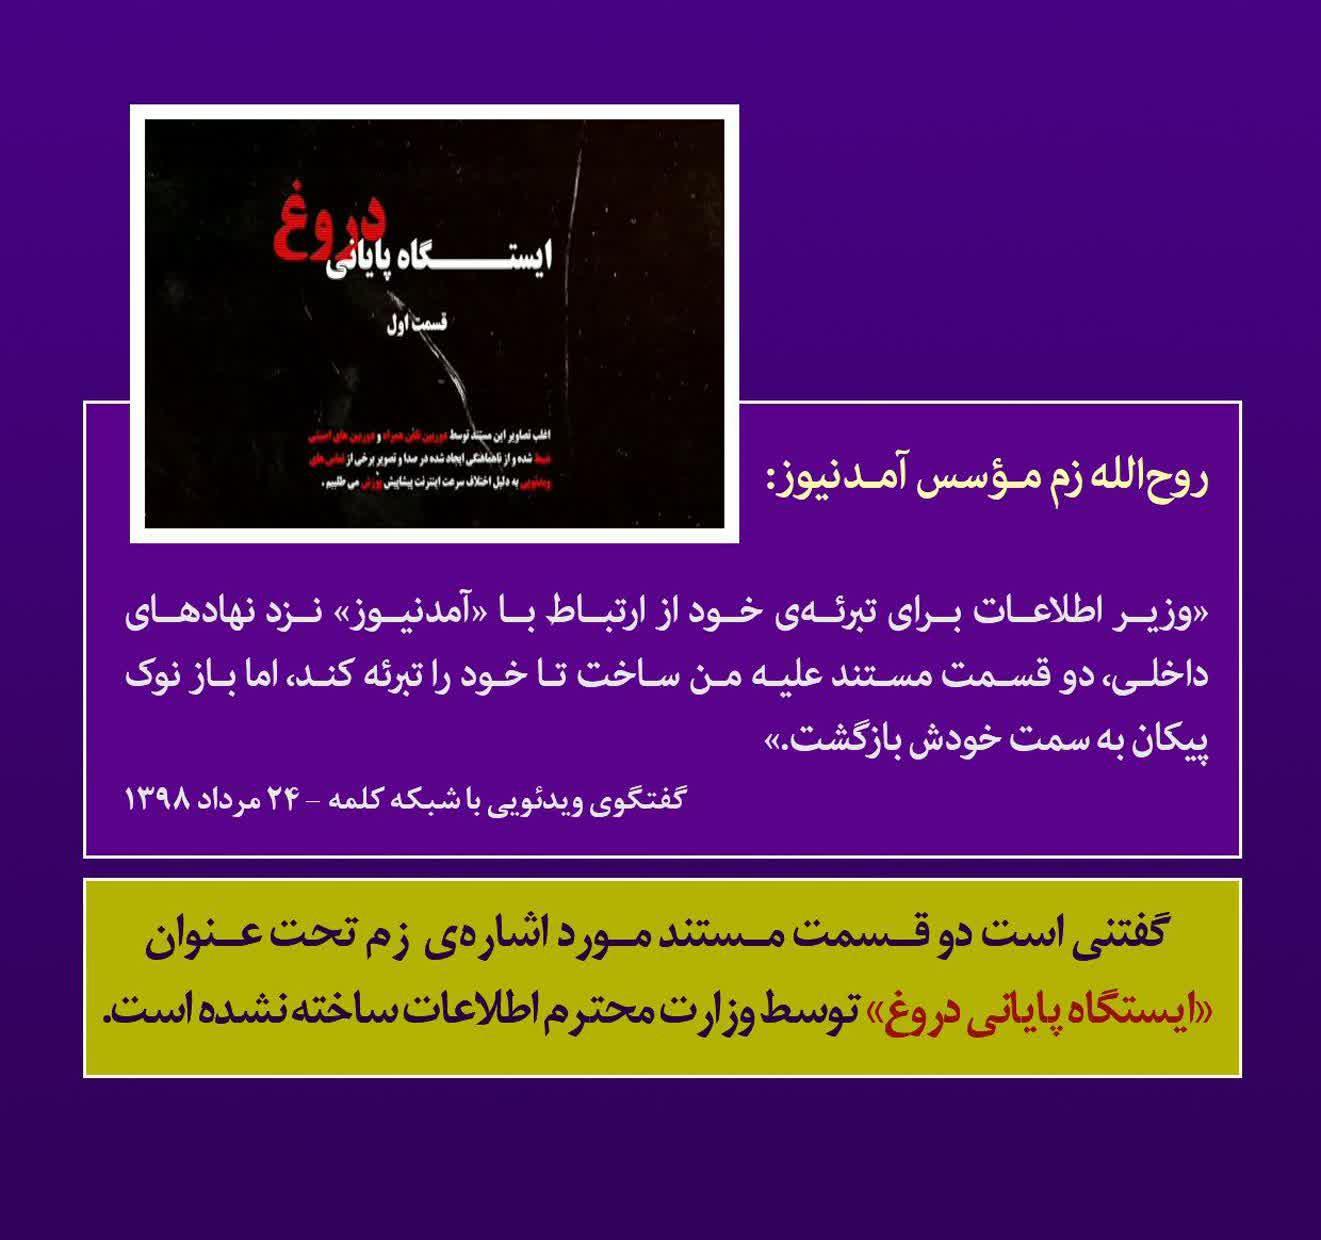 http://dl-abbasi.ir/yekta/1398/Graphic/Amadnews/amadnews%20(23).jpg